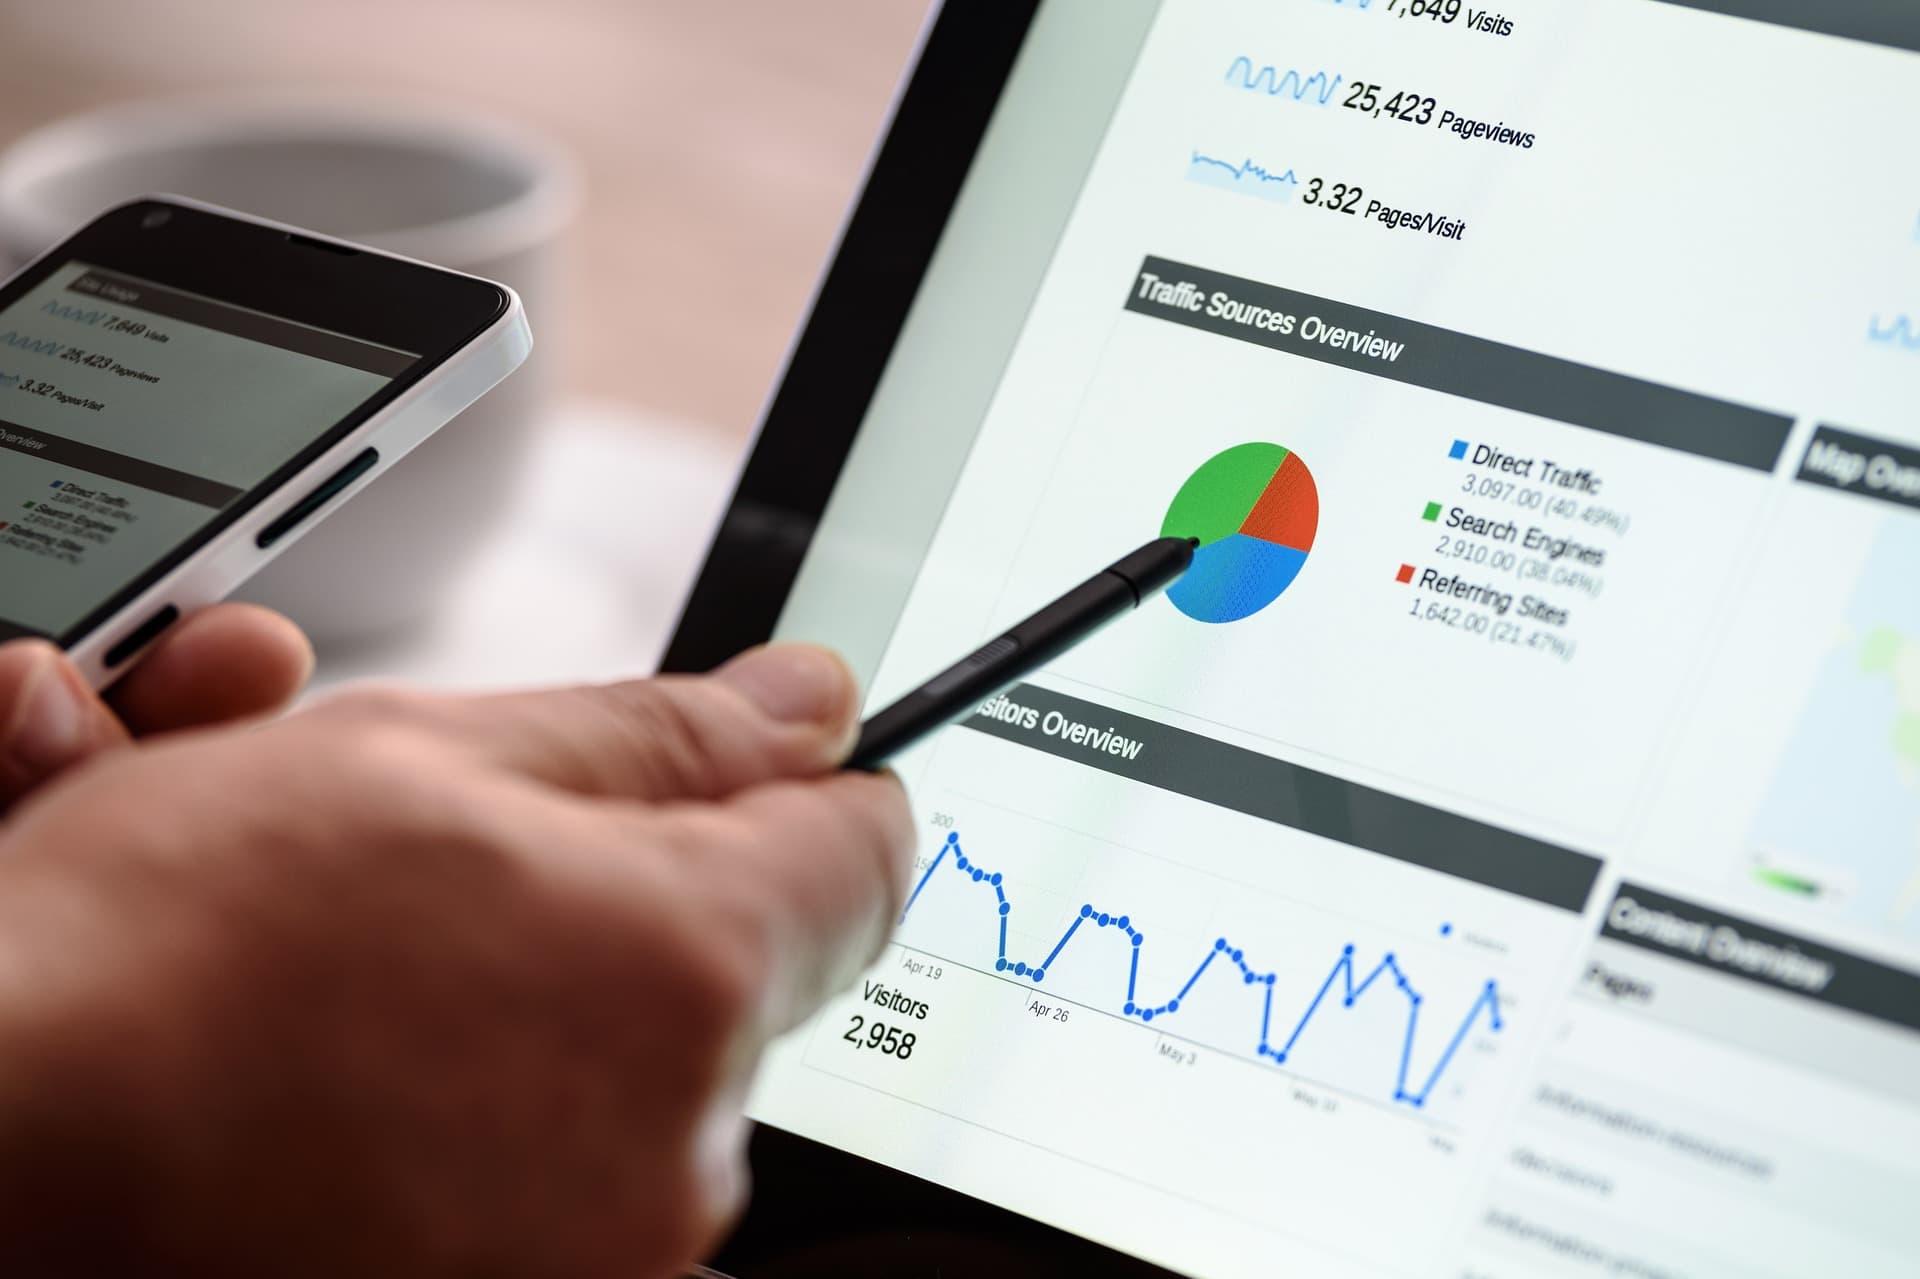 keresőmarketing – Search Engine Marketing (SEM)